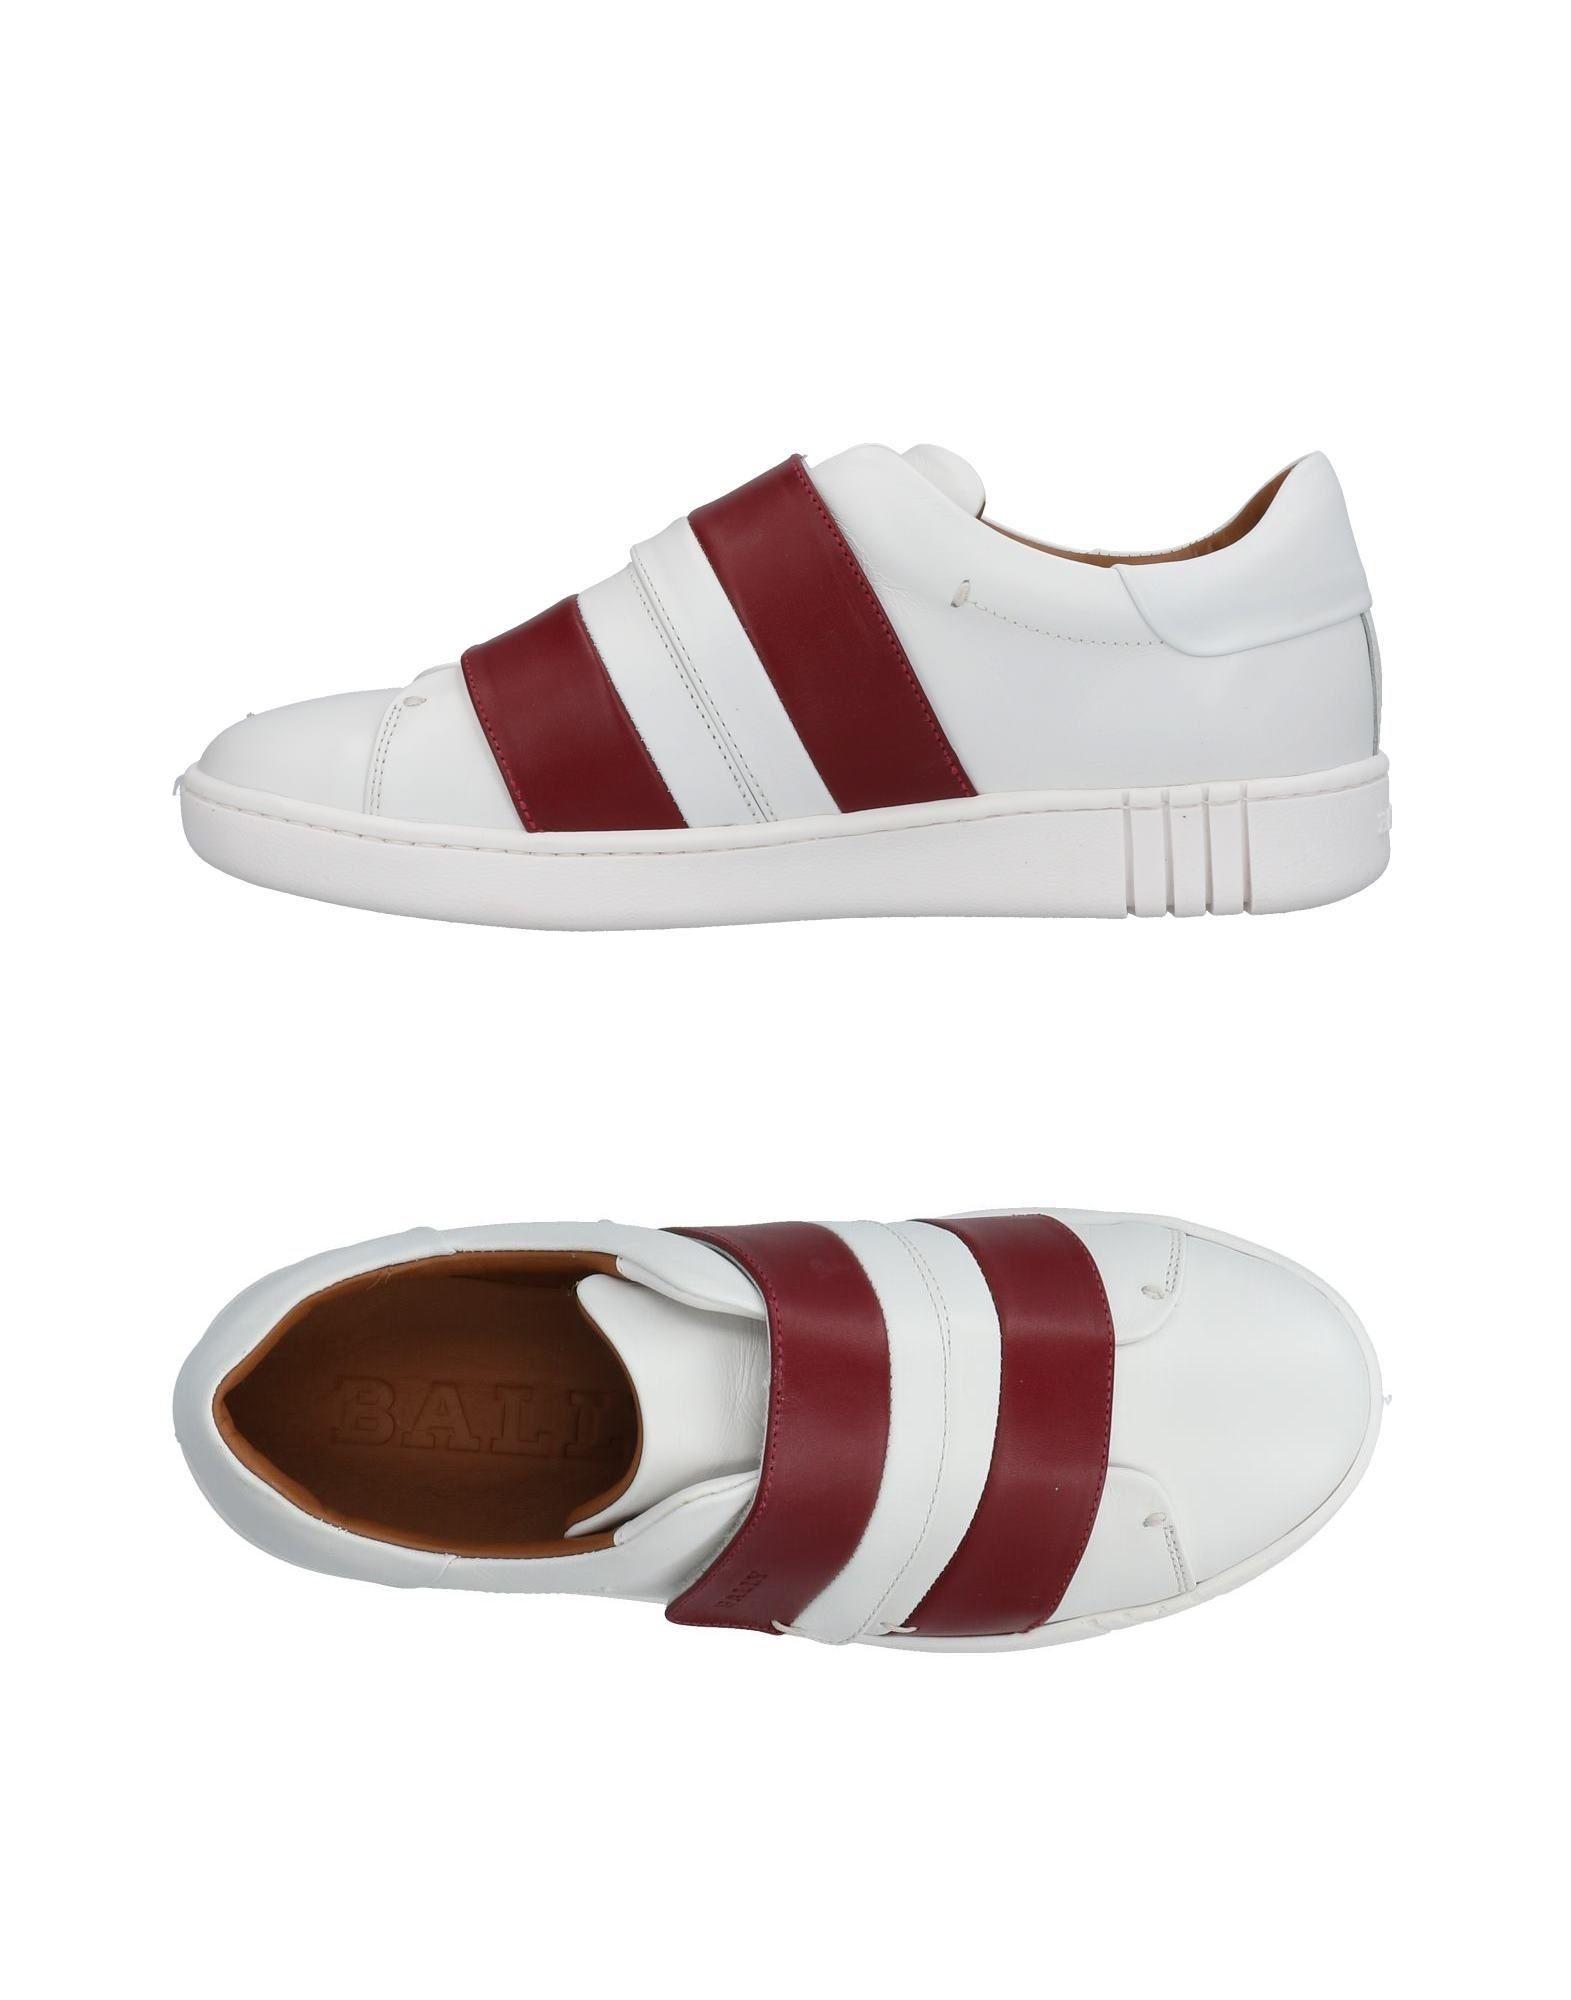 Sneakers Bally Donna - Acquista online su